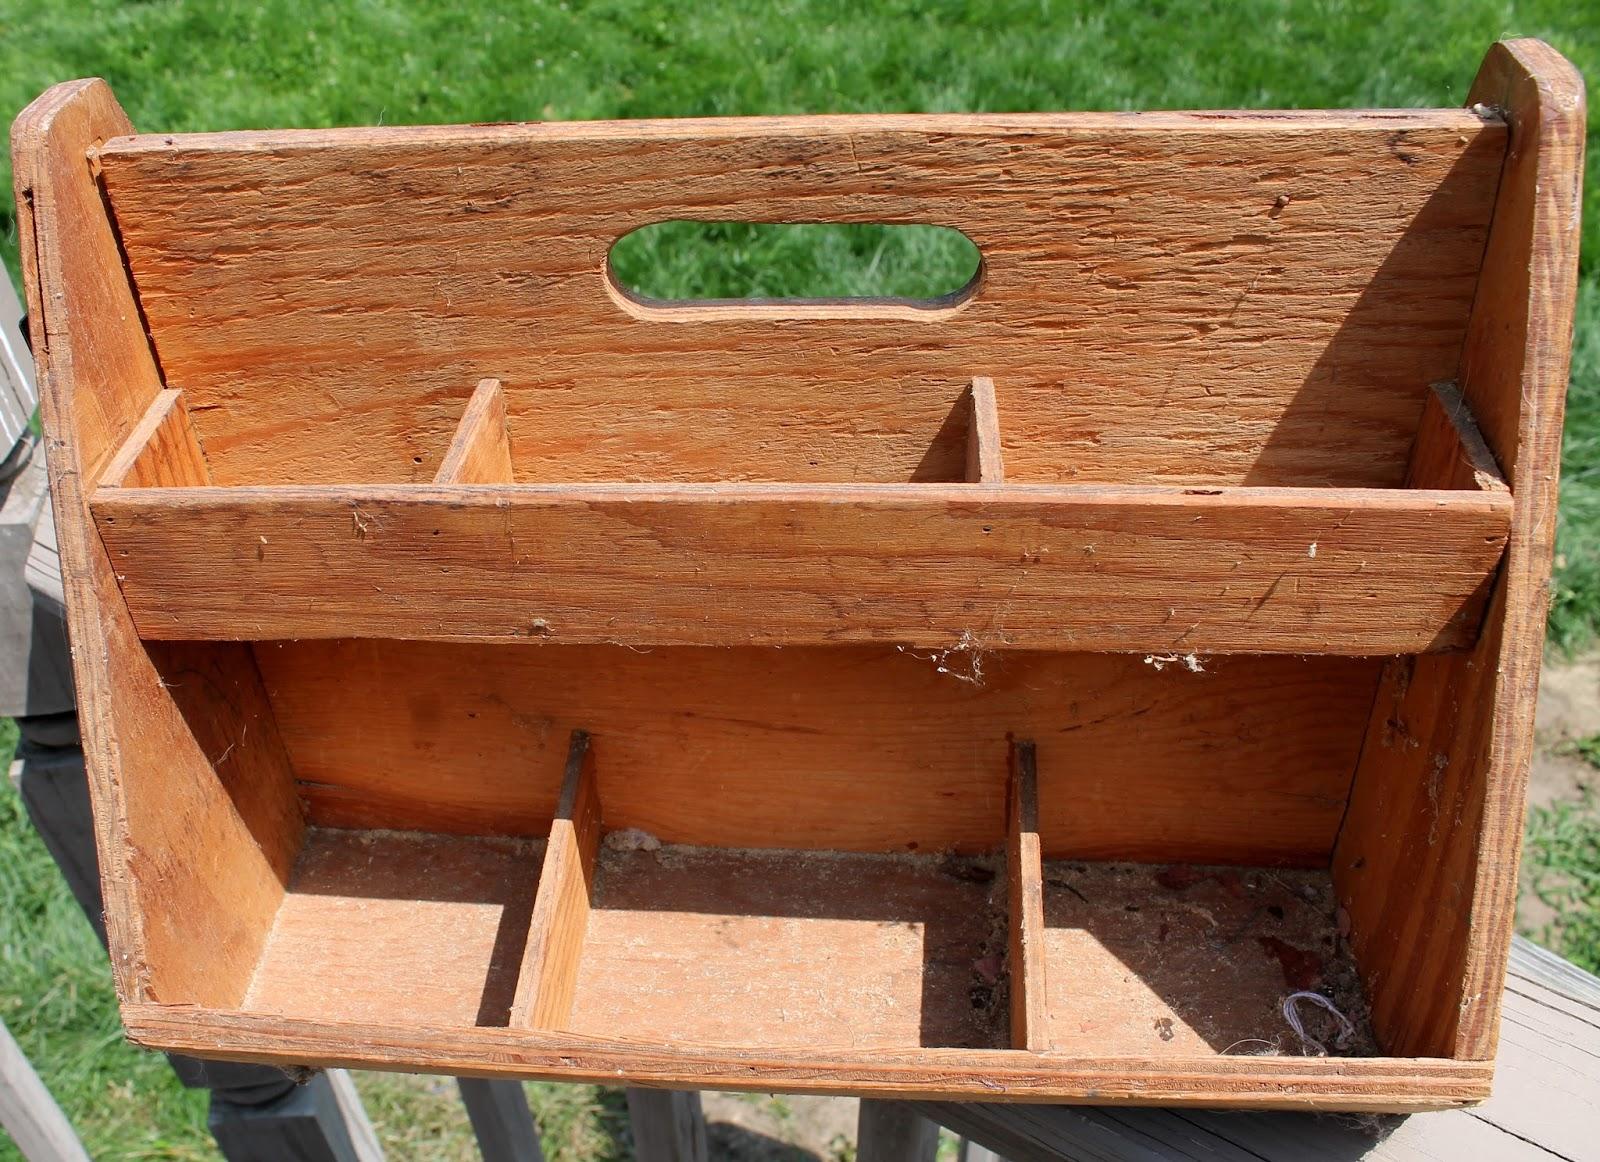 Tool Chest Dresser Makeover: Vintage Tool Box Makeover • Adirondack Girl @ Heart